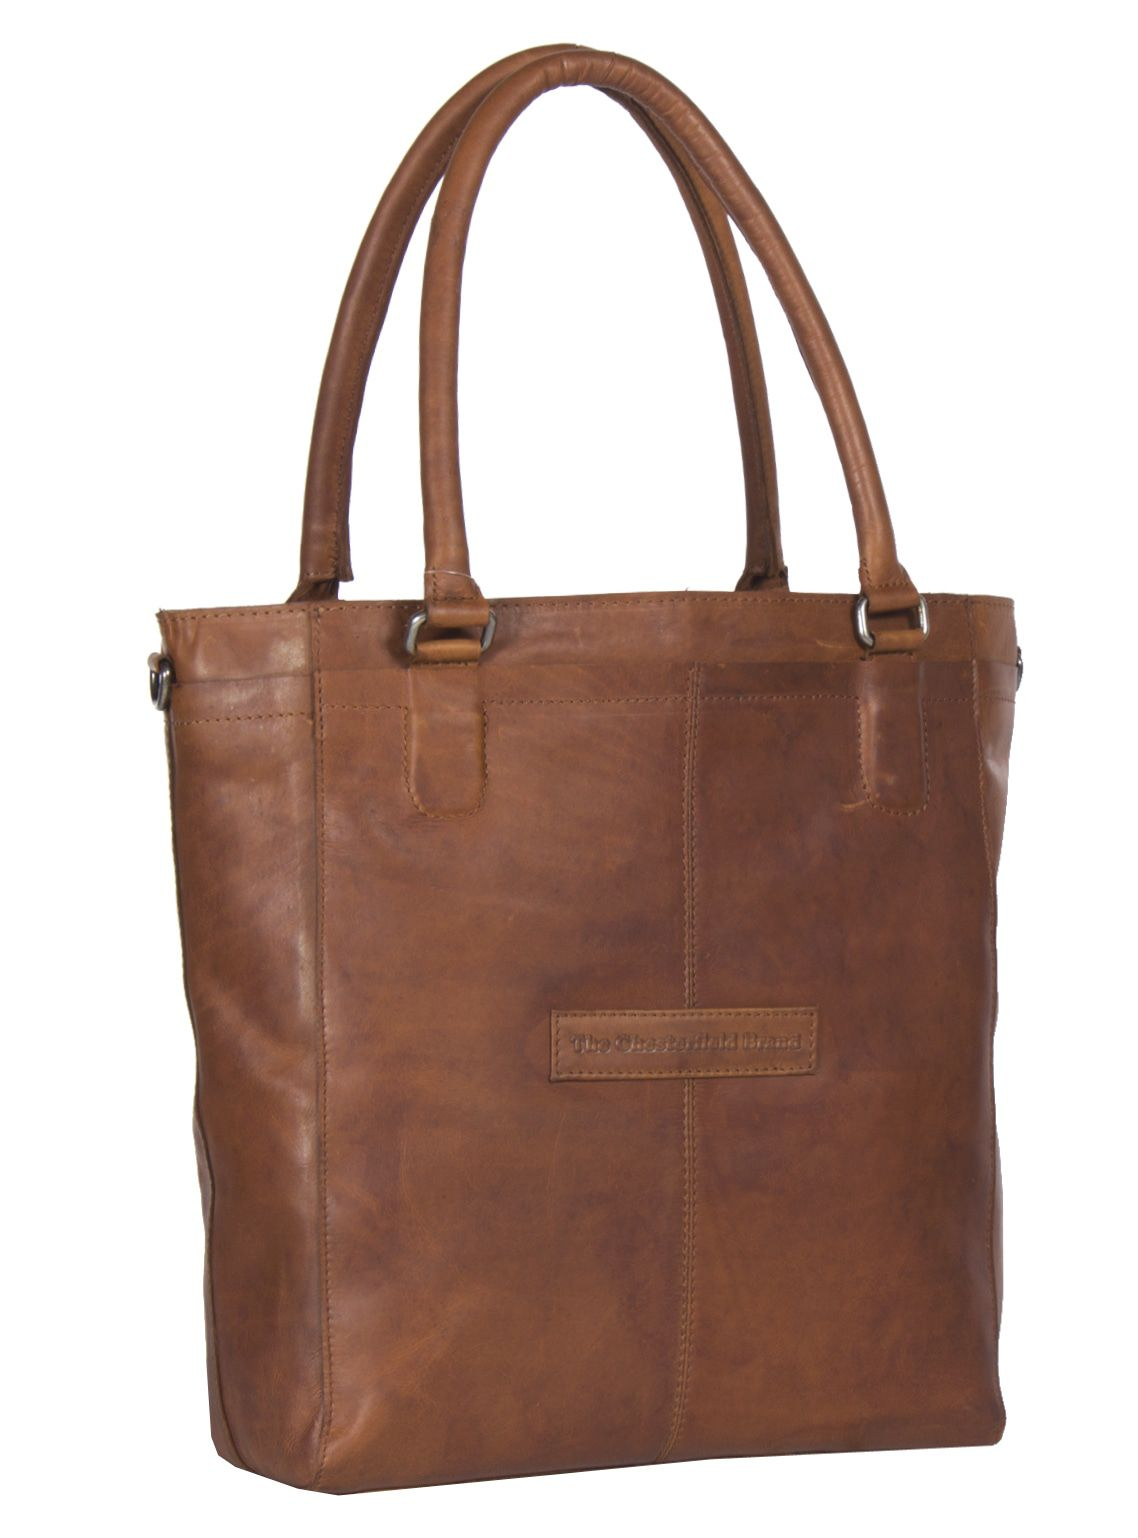 Chesterfield Oldham C38.0126 Shopper Cognac